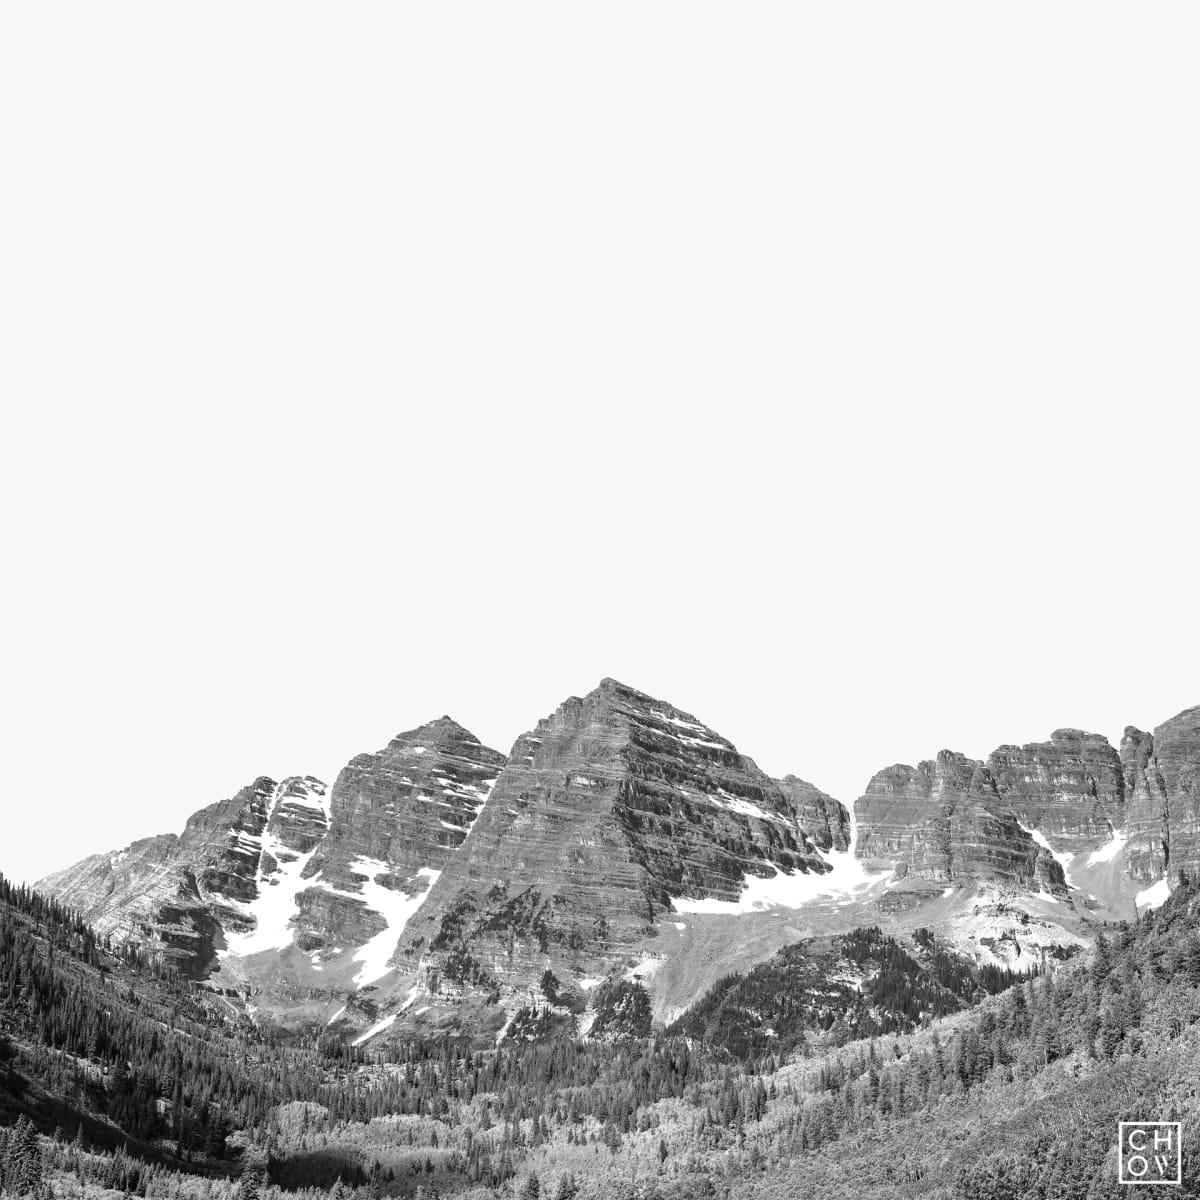 Austin Chow, Maroon Bells // Aspen Colorado, 2020